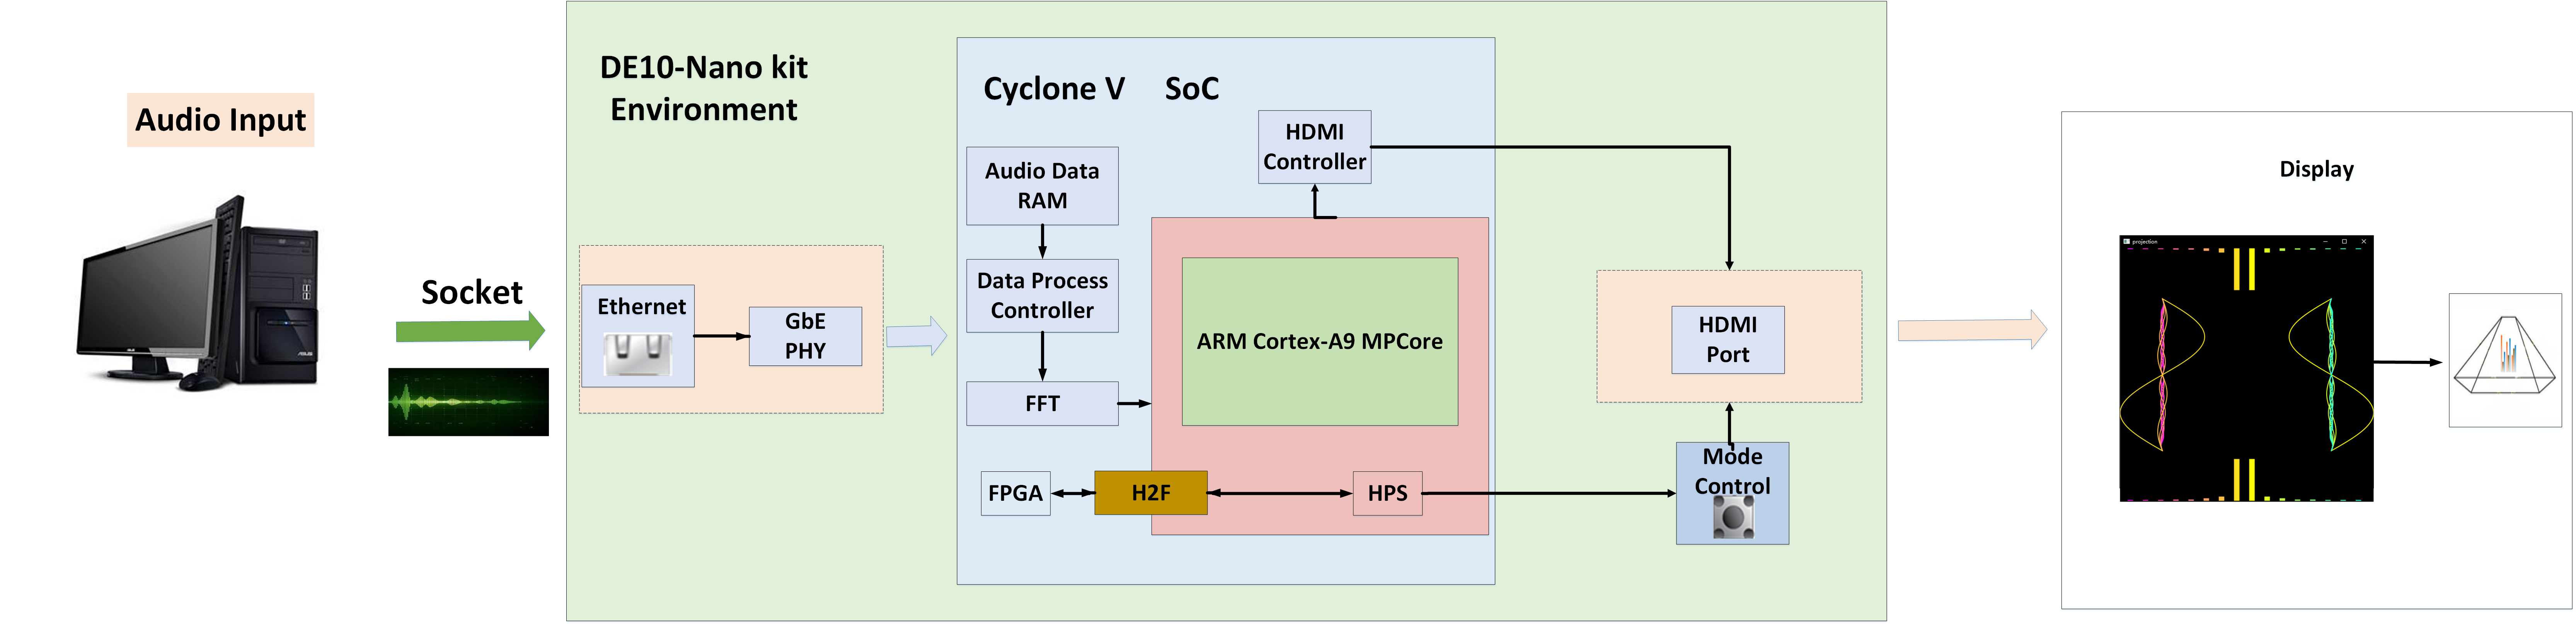 InnovateFPGA   Greater China   PR109 - 音频图像处理及其全息显示(3D